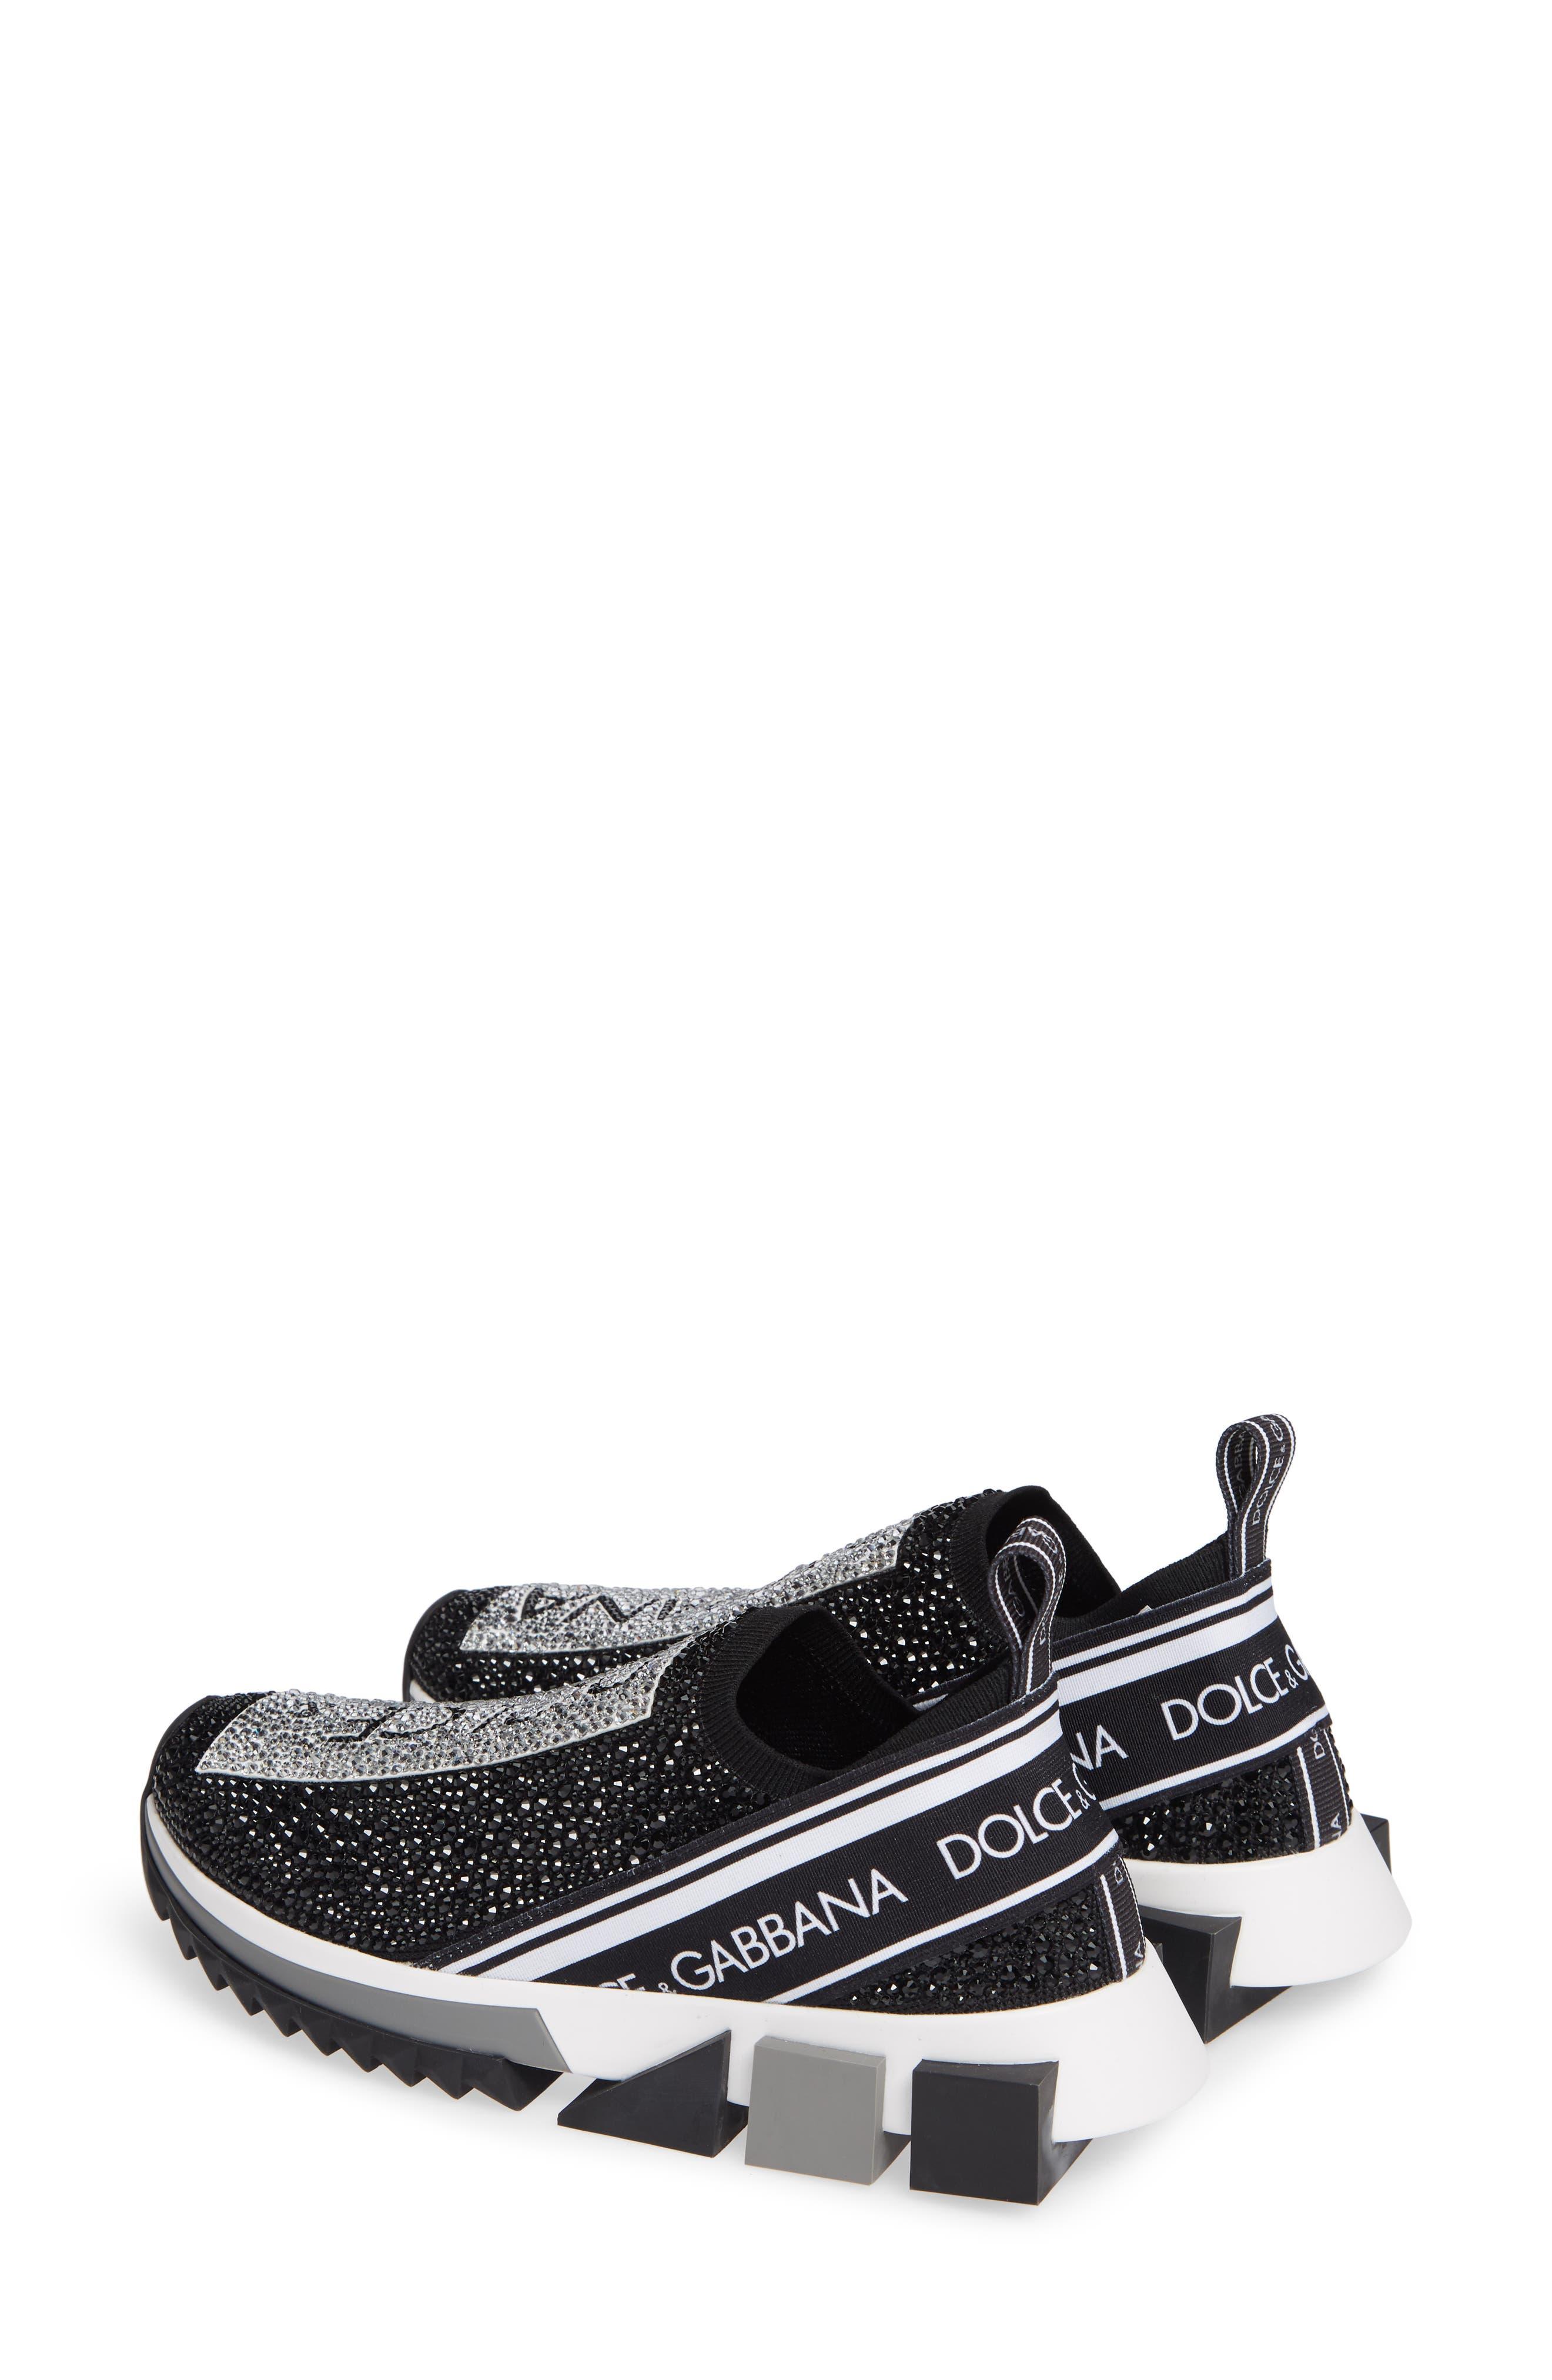 DOLCE&GABBANA, Sorrento Jeweled Logo Sneaker, Alternate thumbnail 3, color, 040